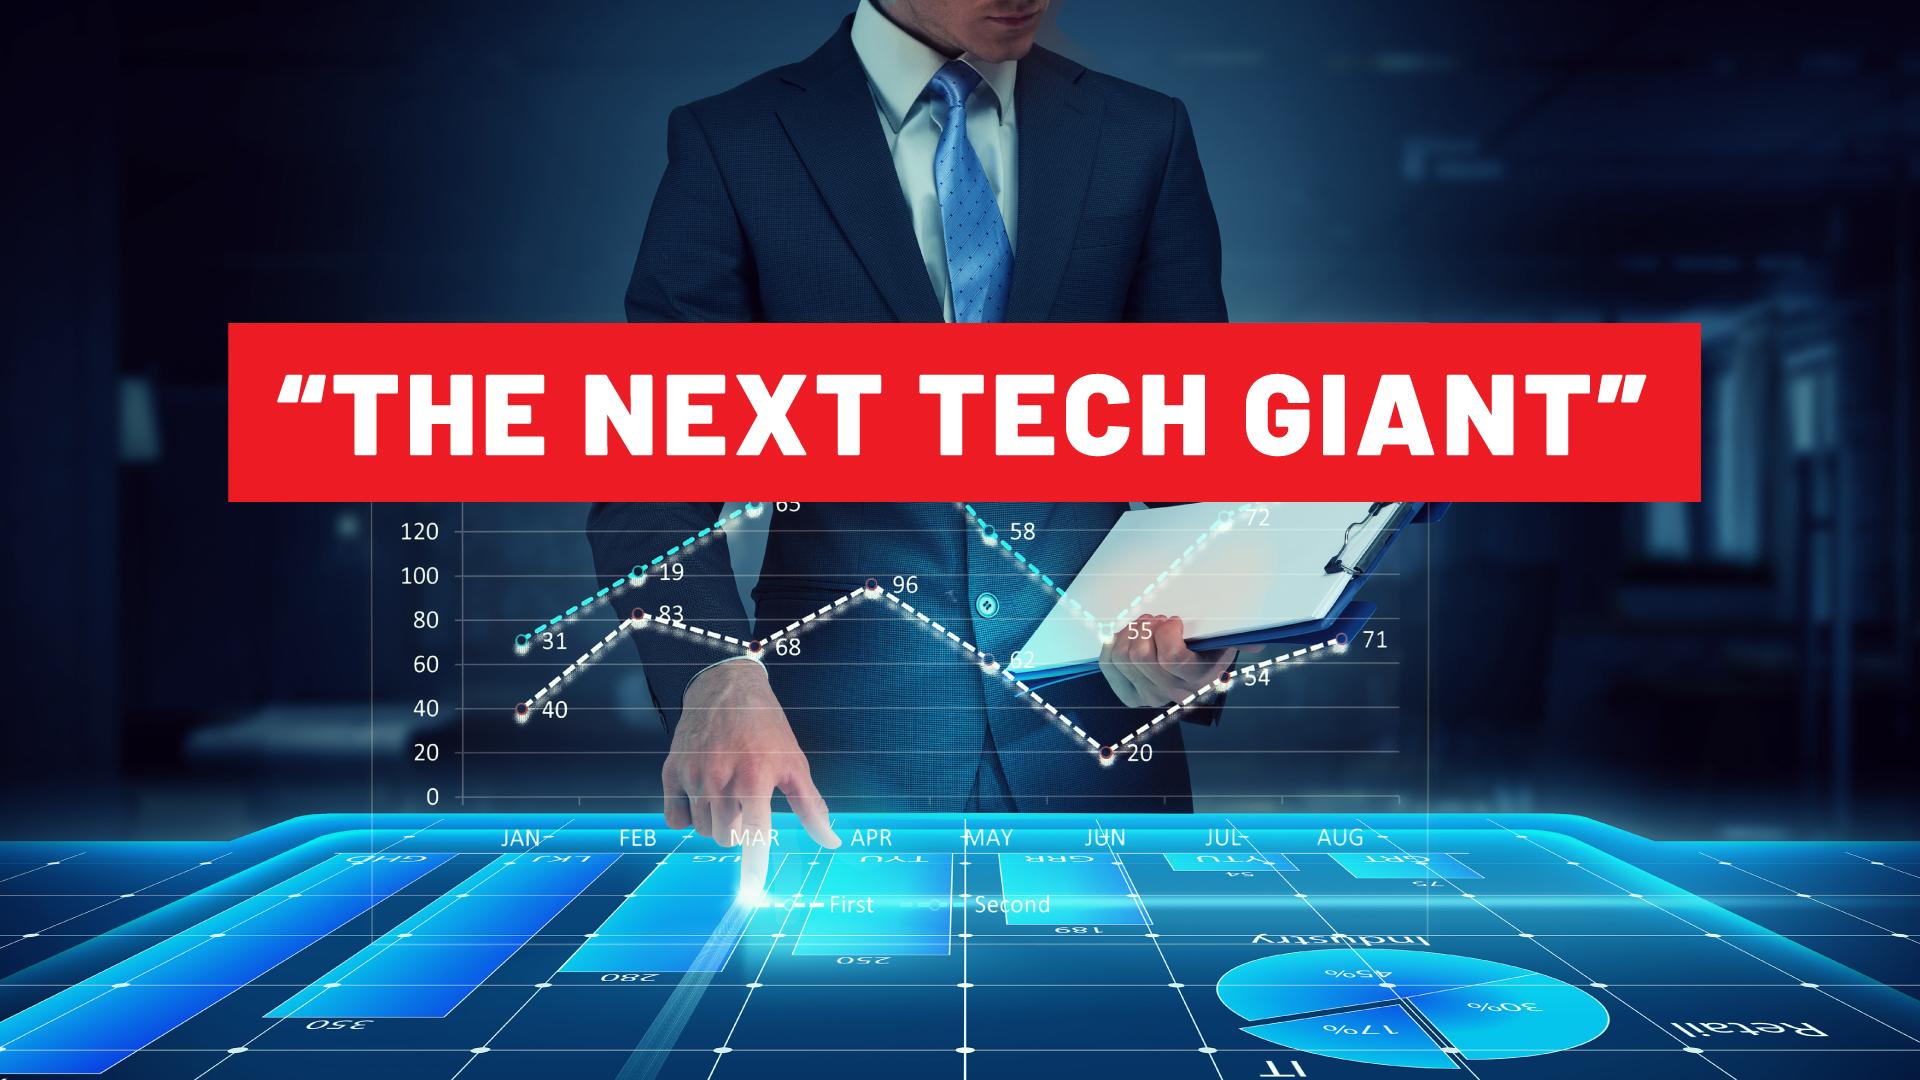 the next tech giant